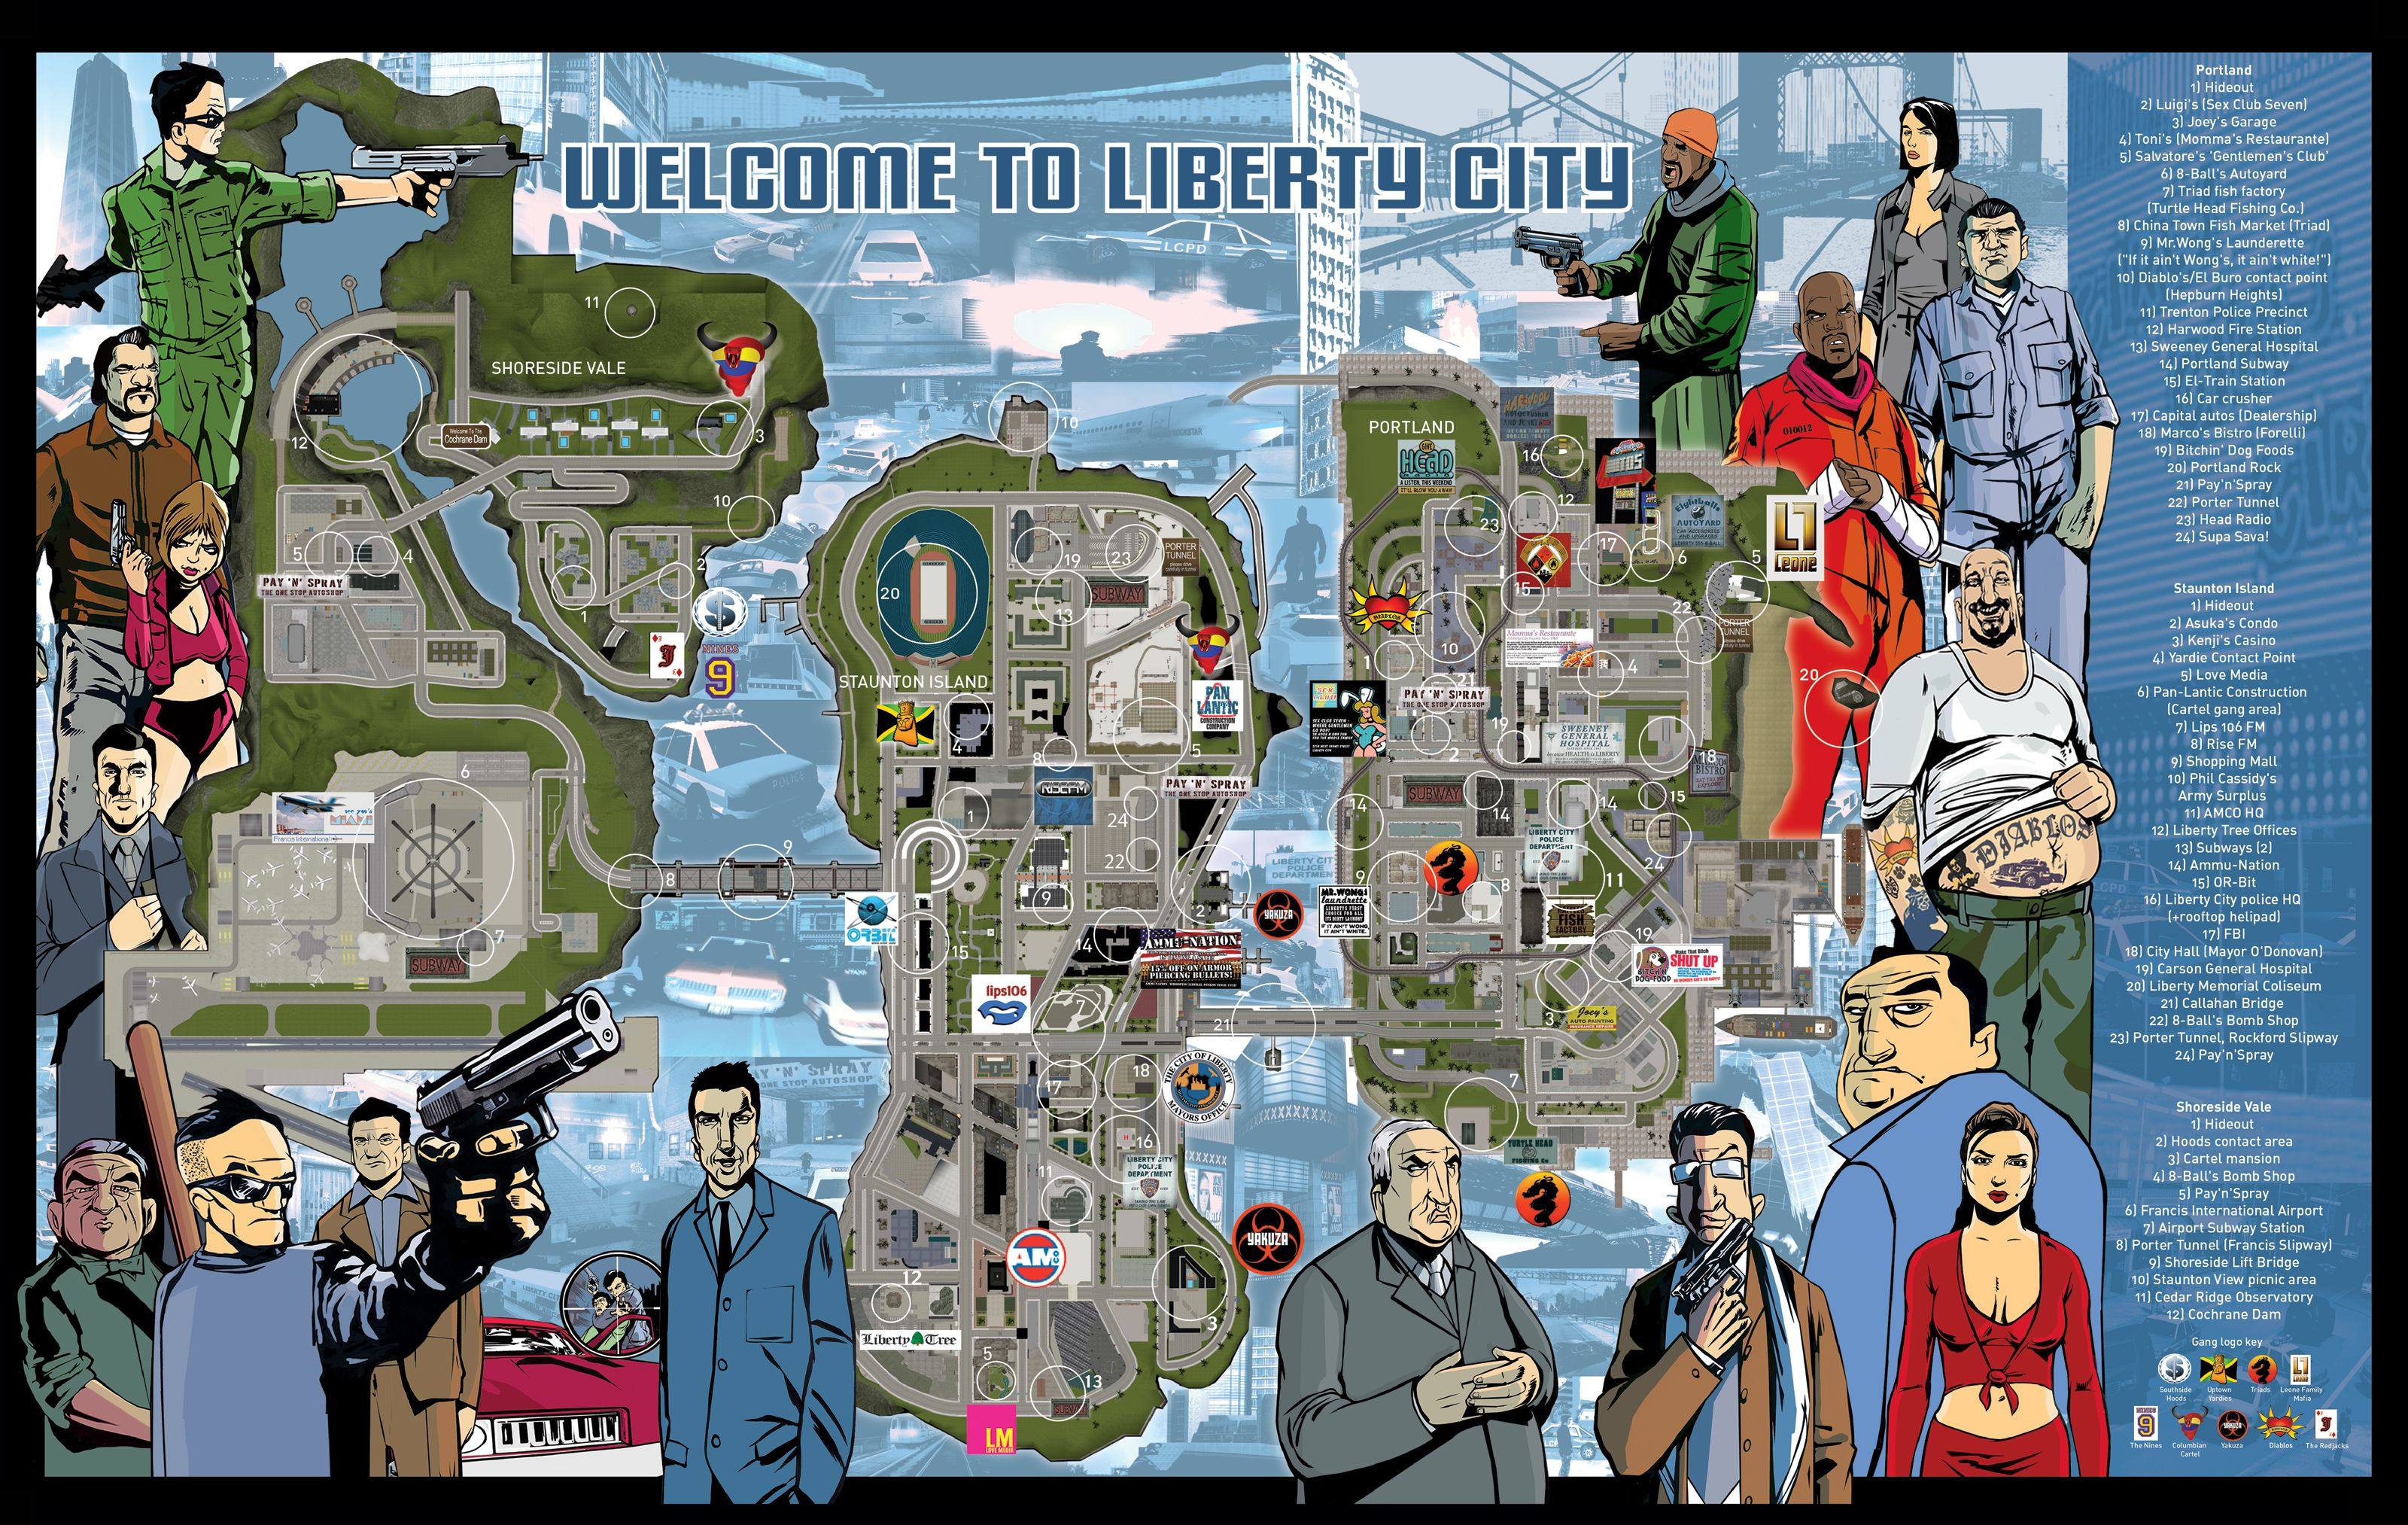 Grand Theft Auto 5 Ausmalbilder : Gta 3 Google Search Grand Theft Auto Pinterest Gta Grand